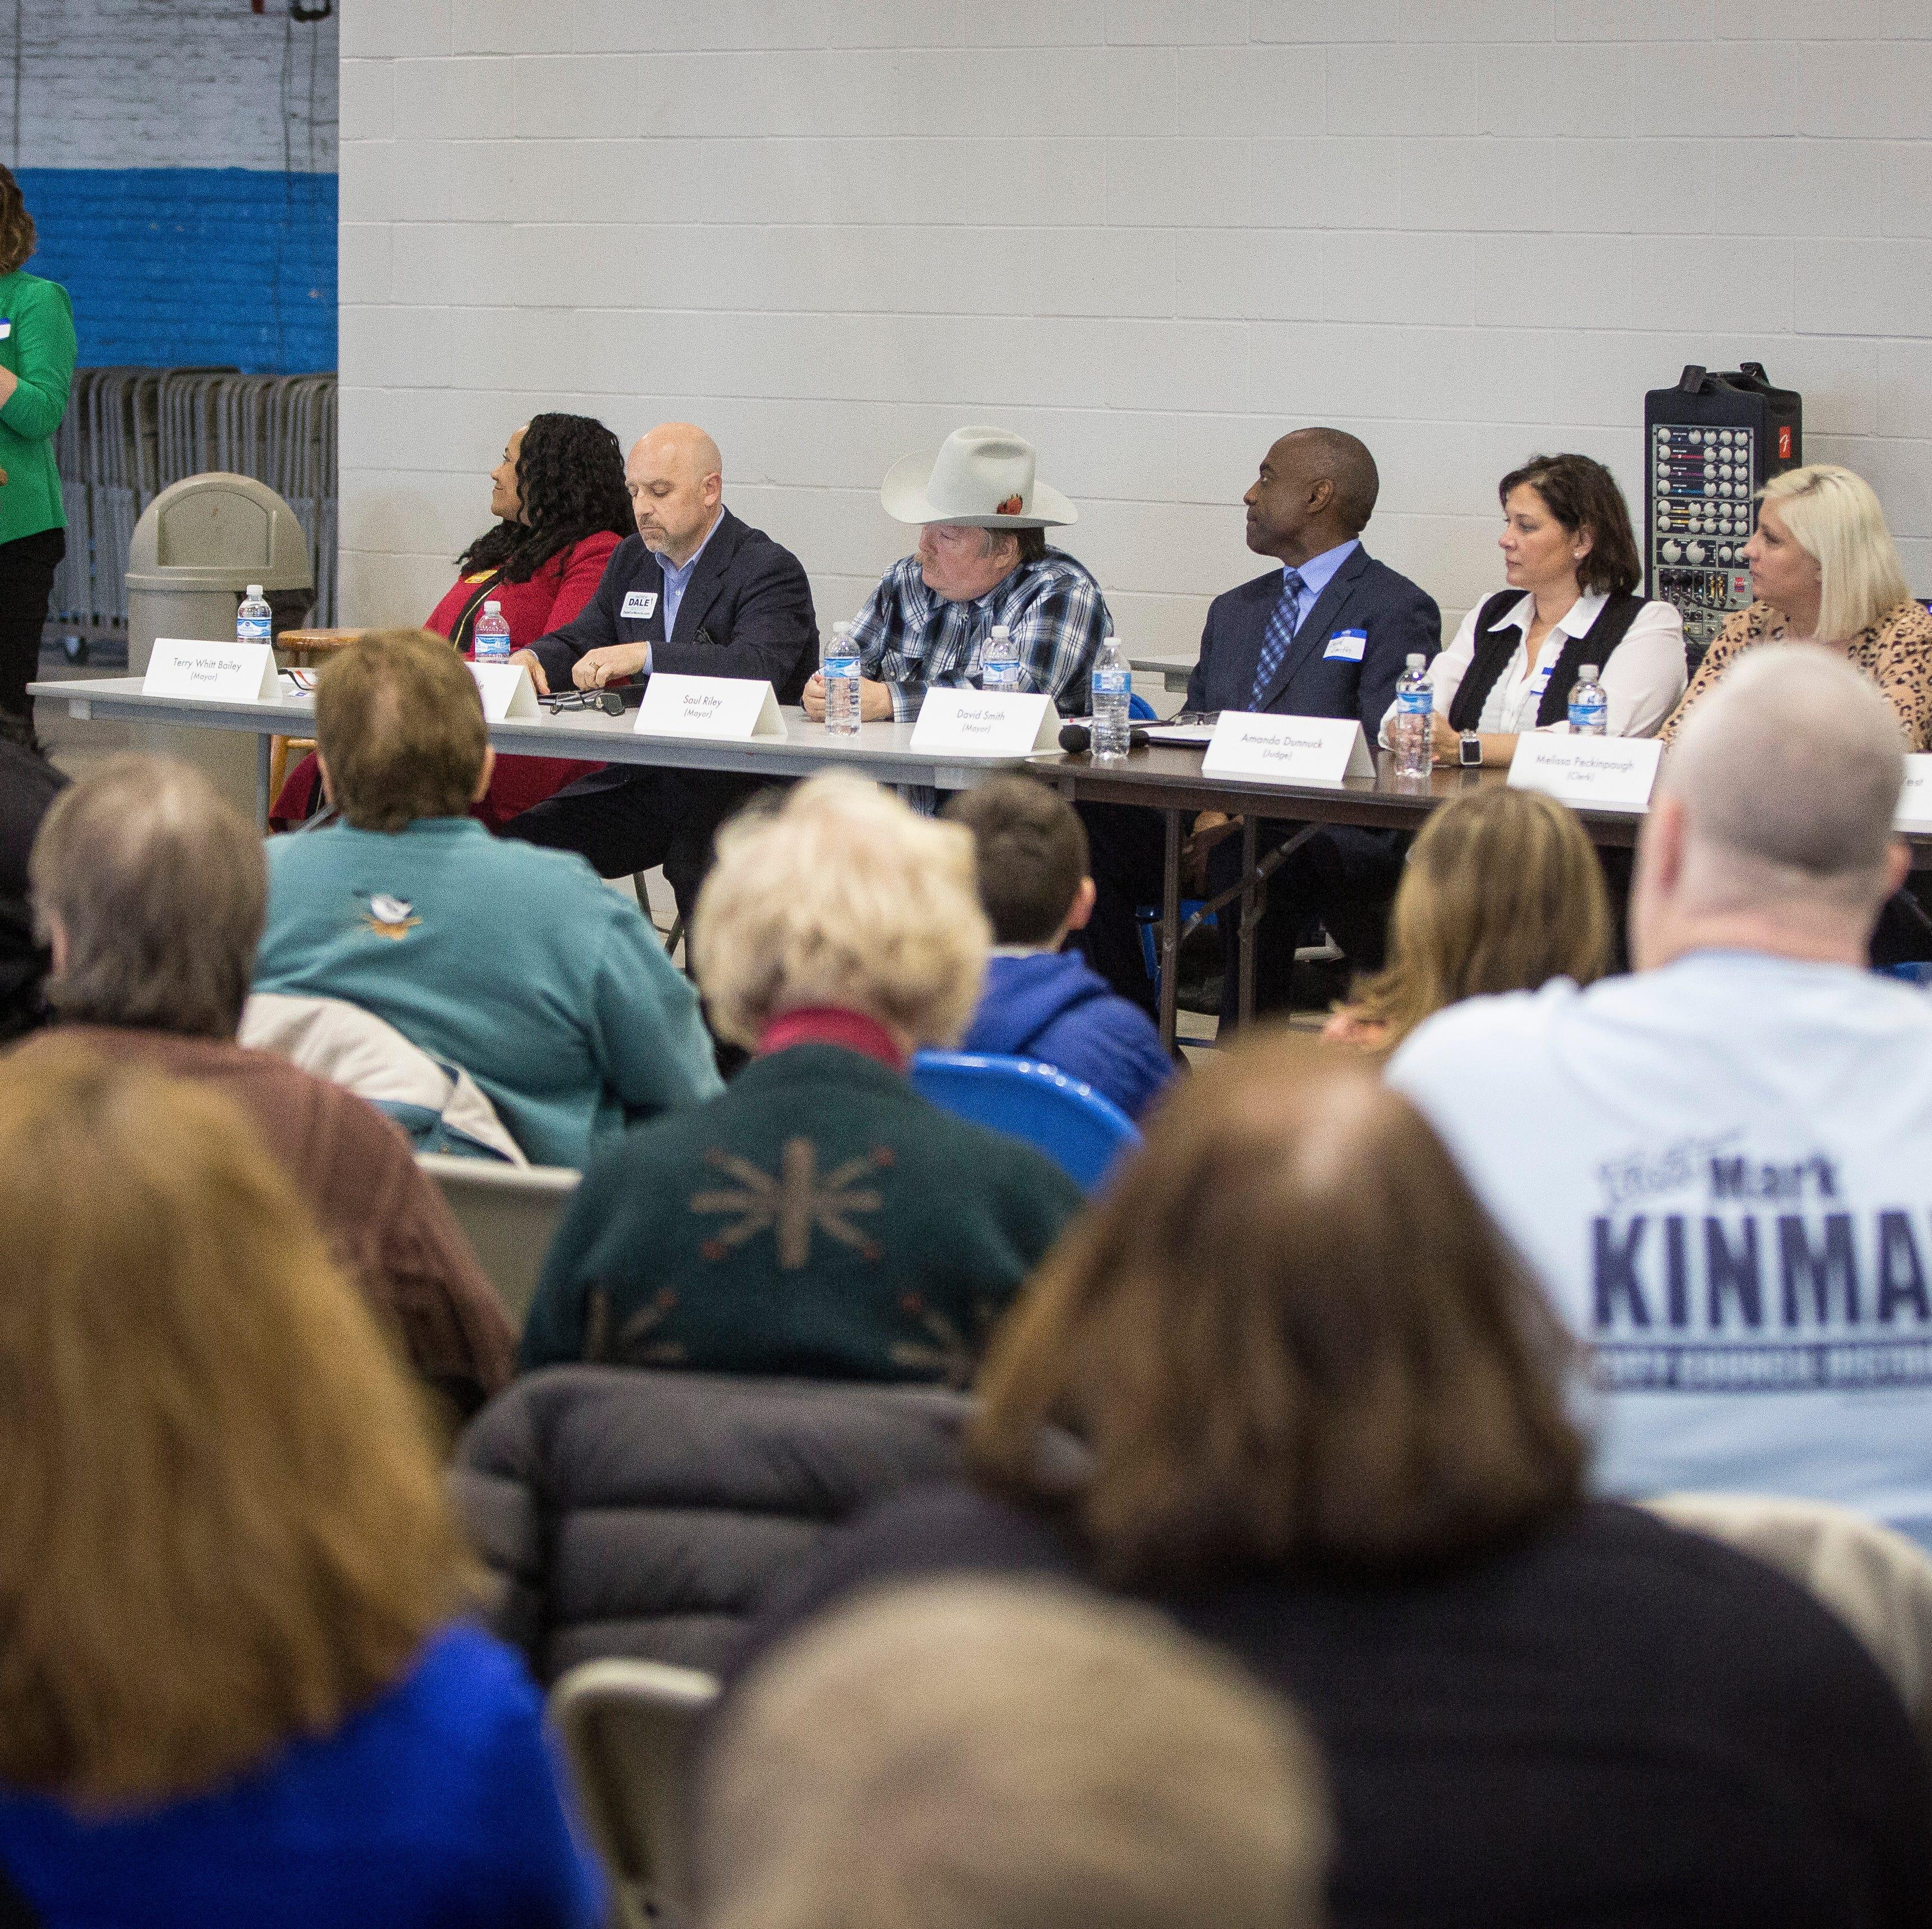 Focus on corruption overtakes Democrat forum